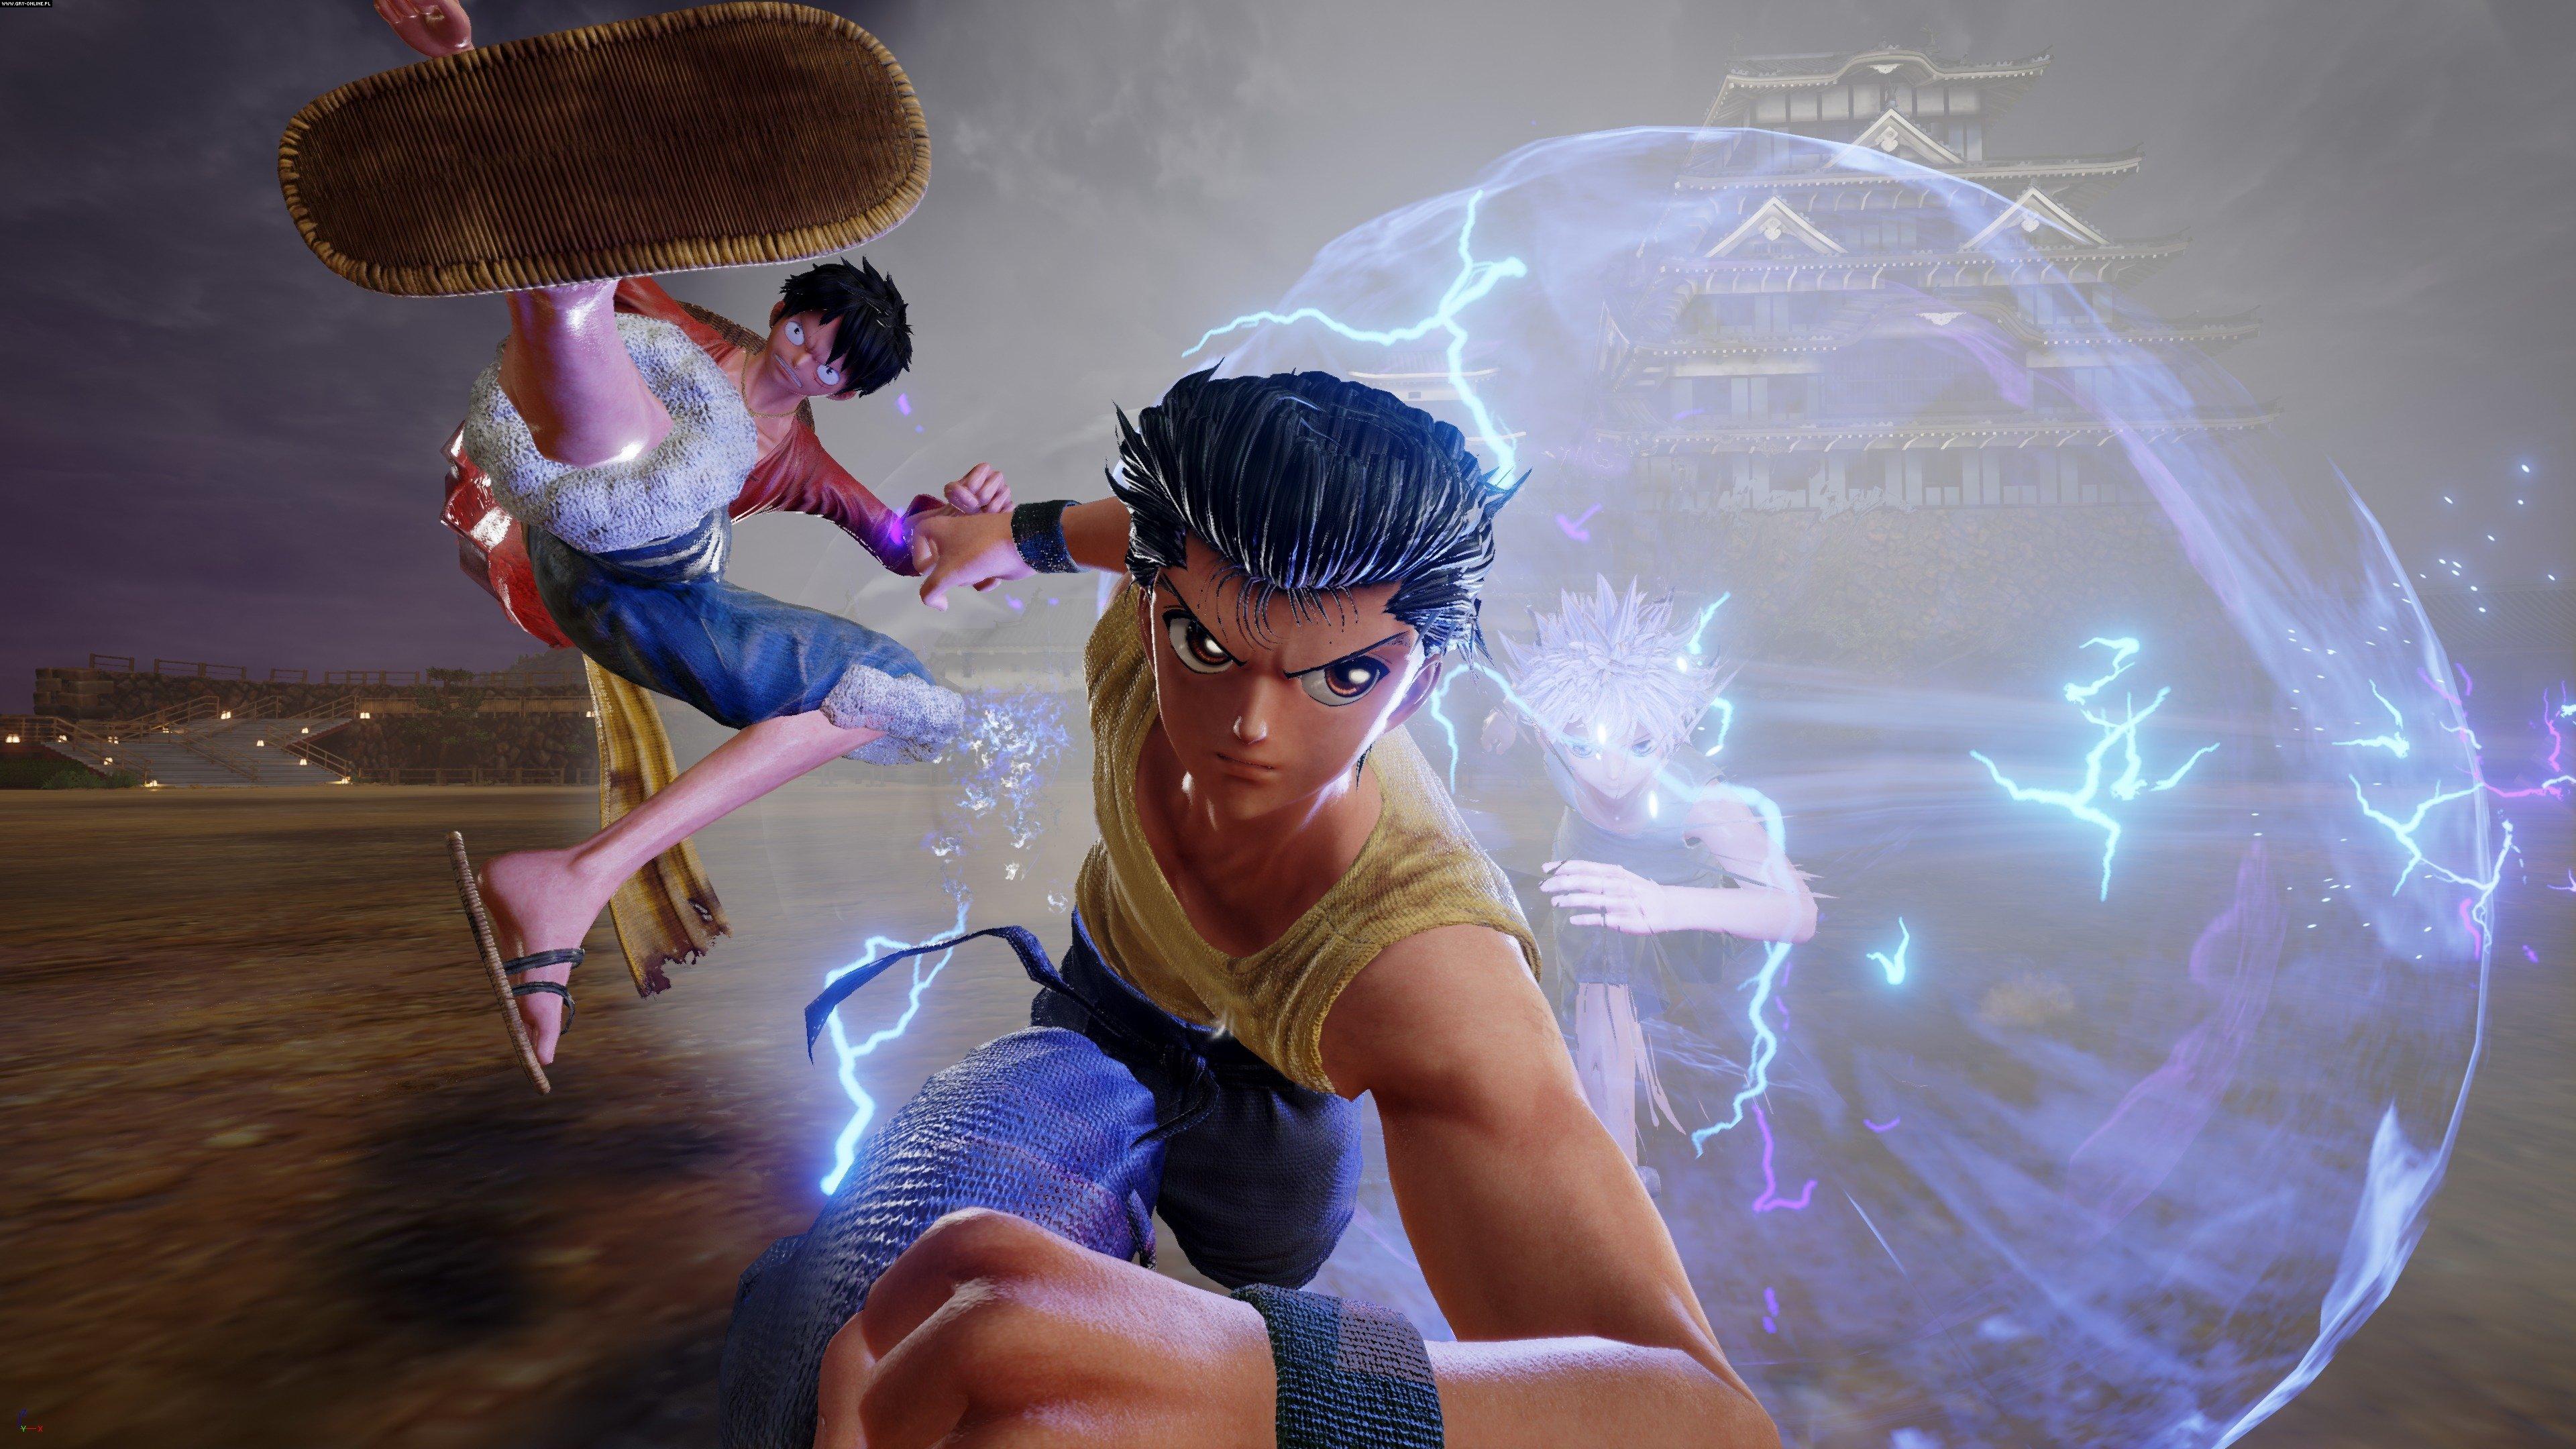 Jump Force PC, PS4, XONE Games Image 151/212, Spike Chunsoft, Bandai Namco Entertainment